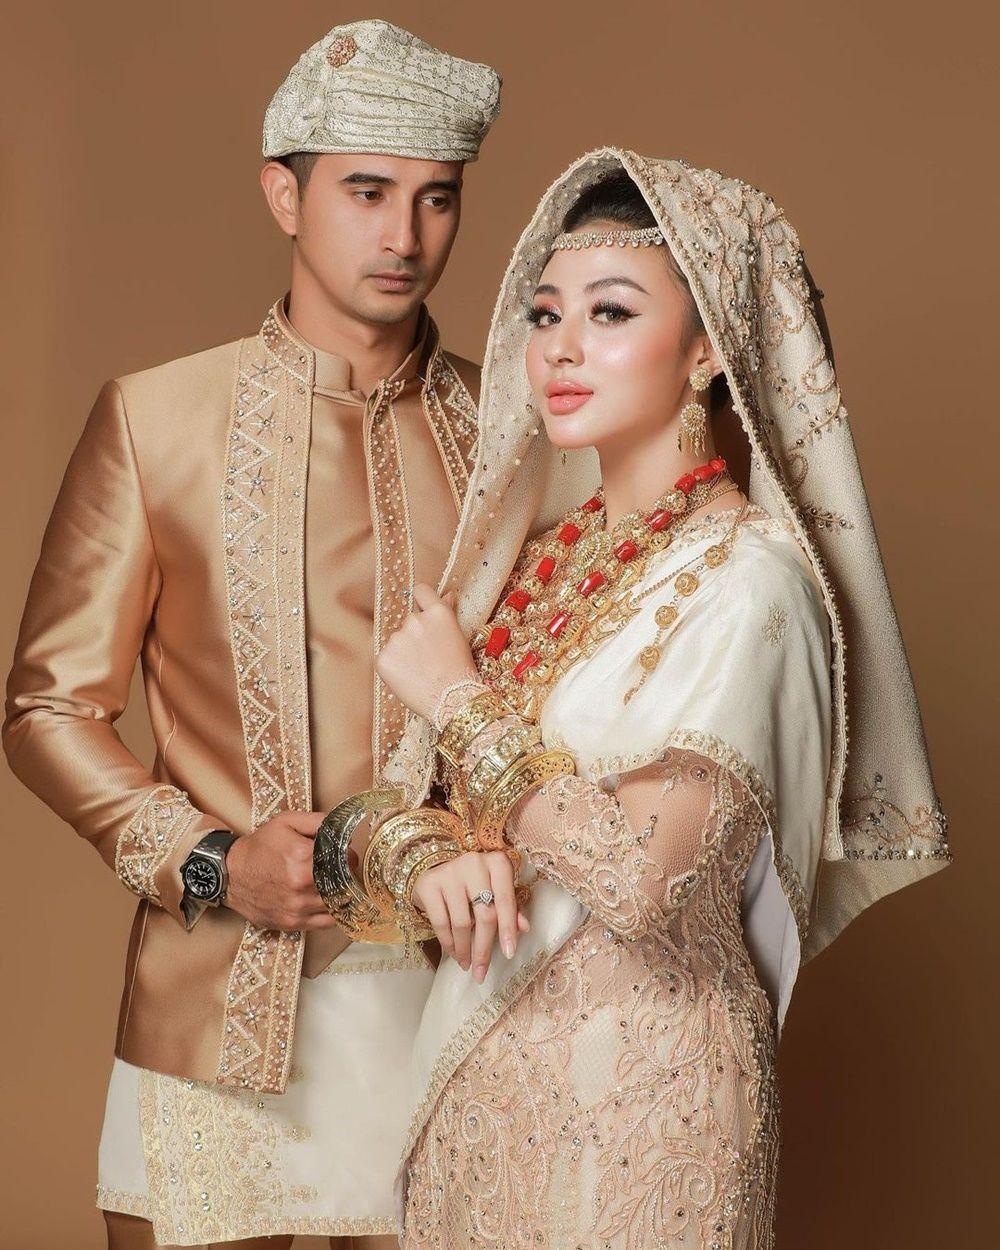 10 Foto Pre-Wedding Ali Syakieb & Margin, dari Gaya Klasik Hingga Adat